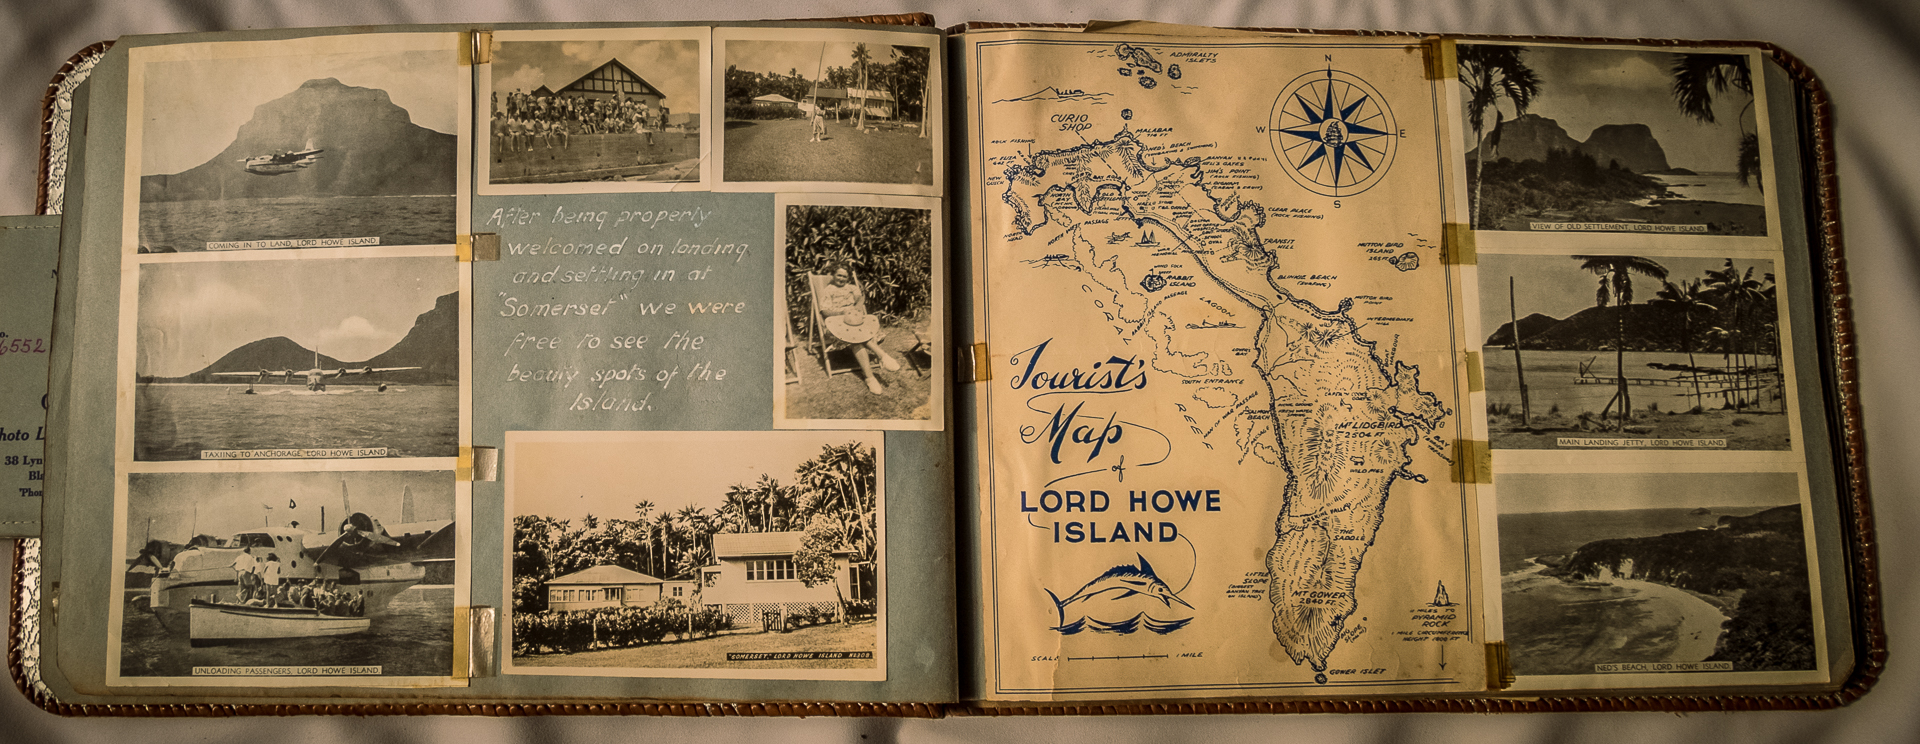 Lord How Island 1954-5